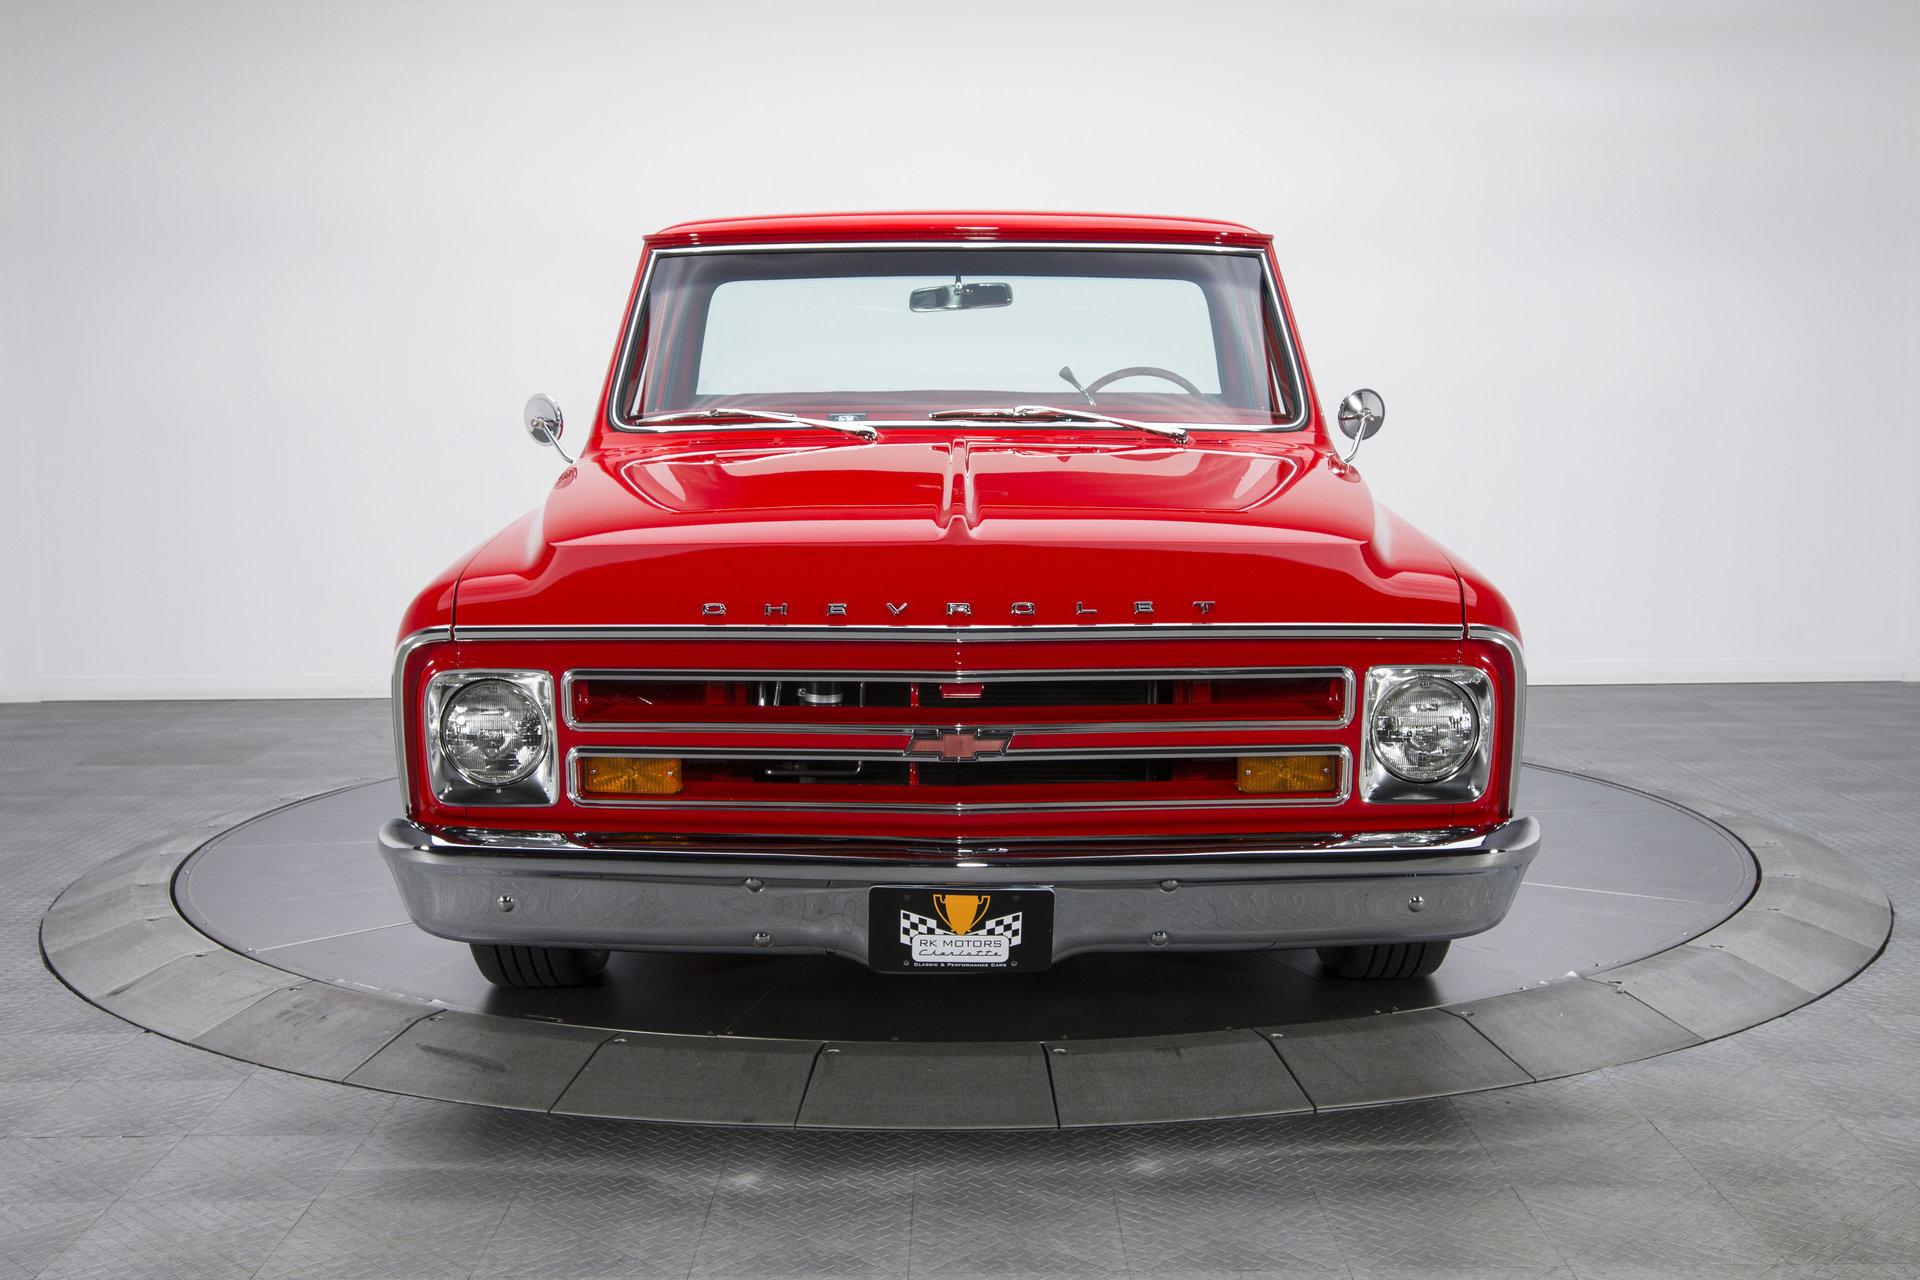 136041 1968 Chevrolet C10 Pickup Truck Rk Motors Classic And 1966 Chevy Door Panels For Sale